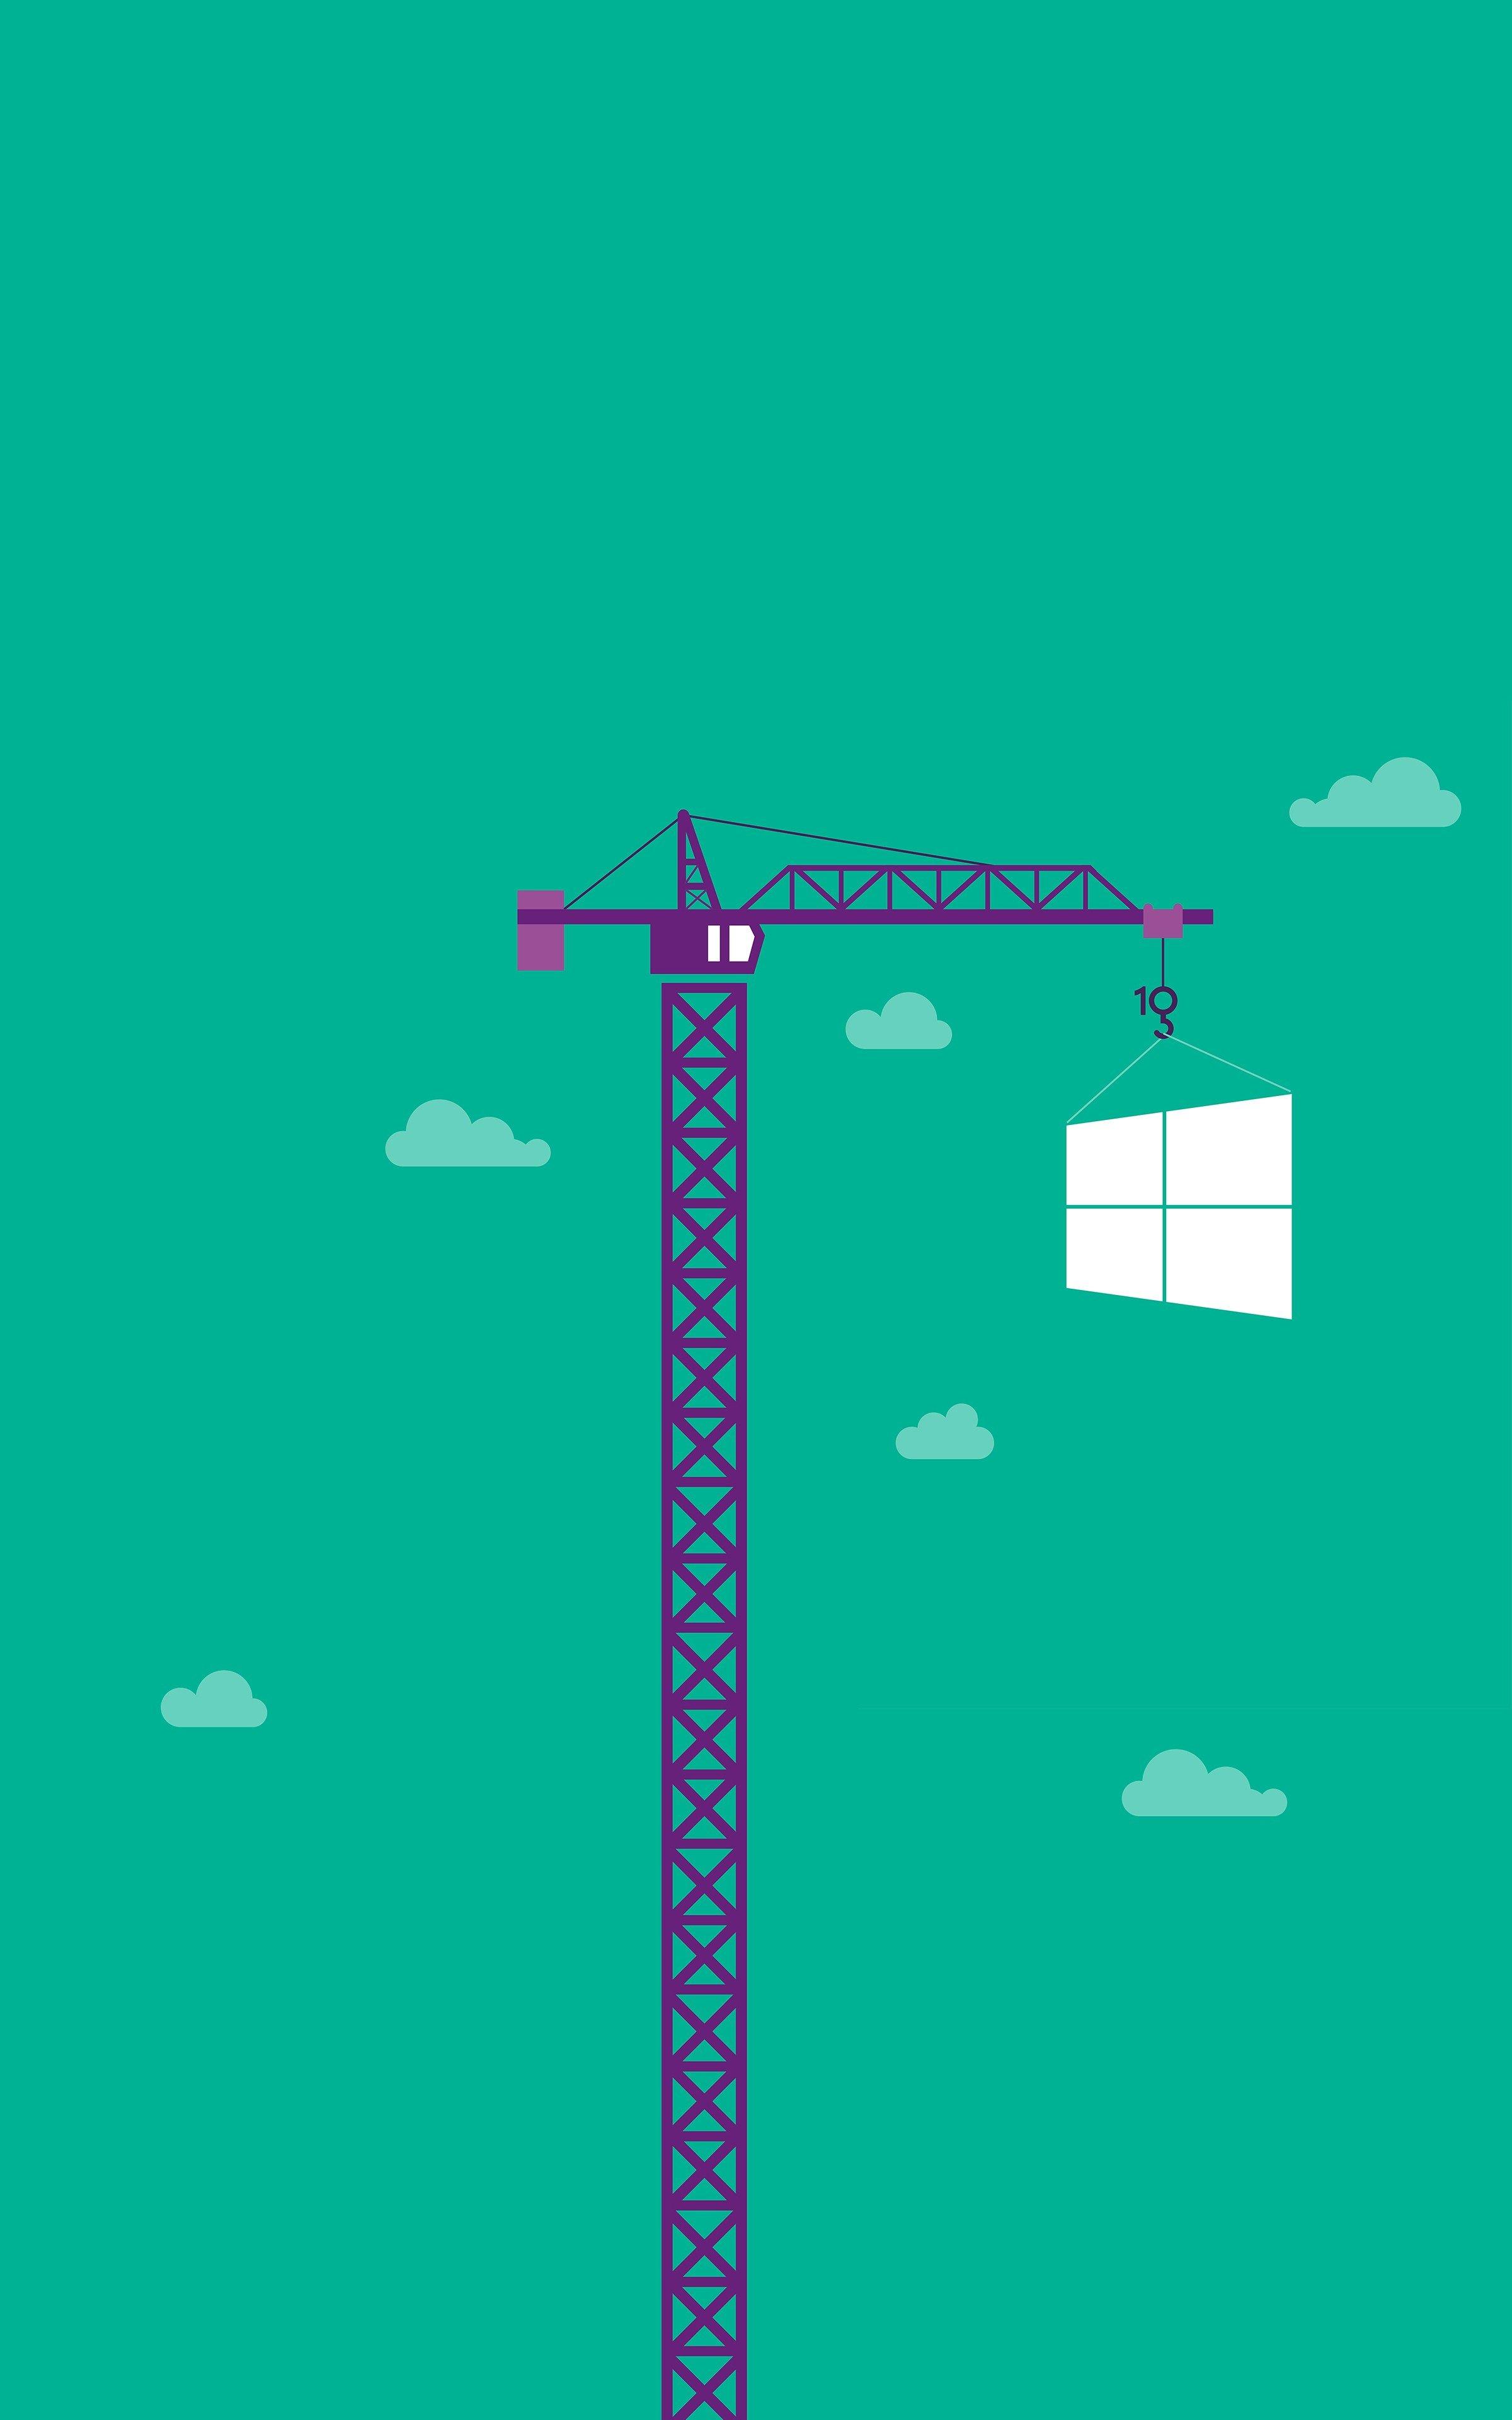 X Px Microsoft Windows Minimalism Operating Systems Portrait Display Windows